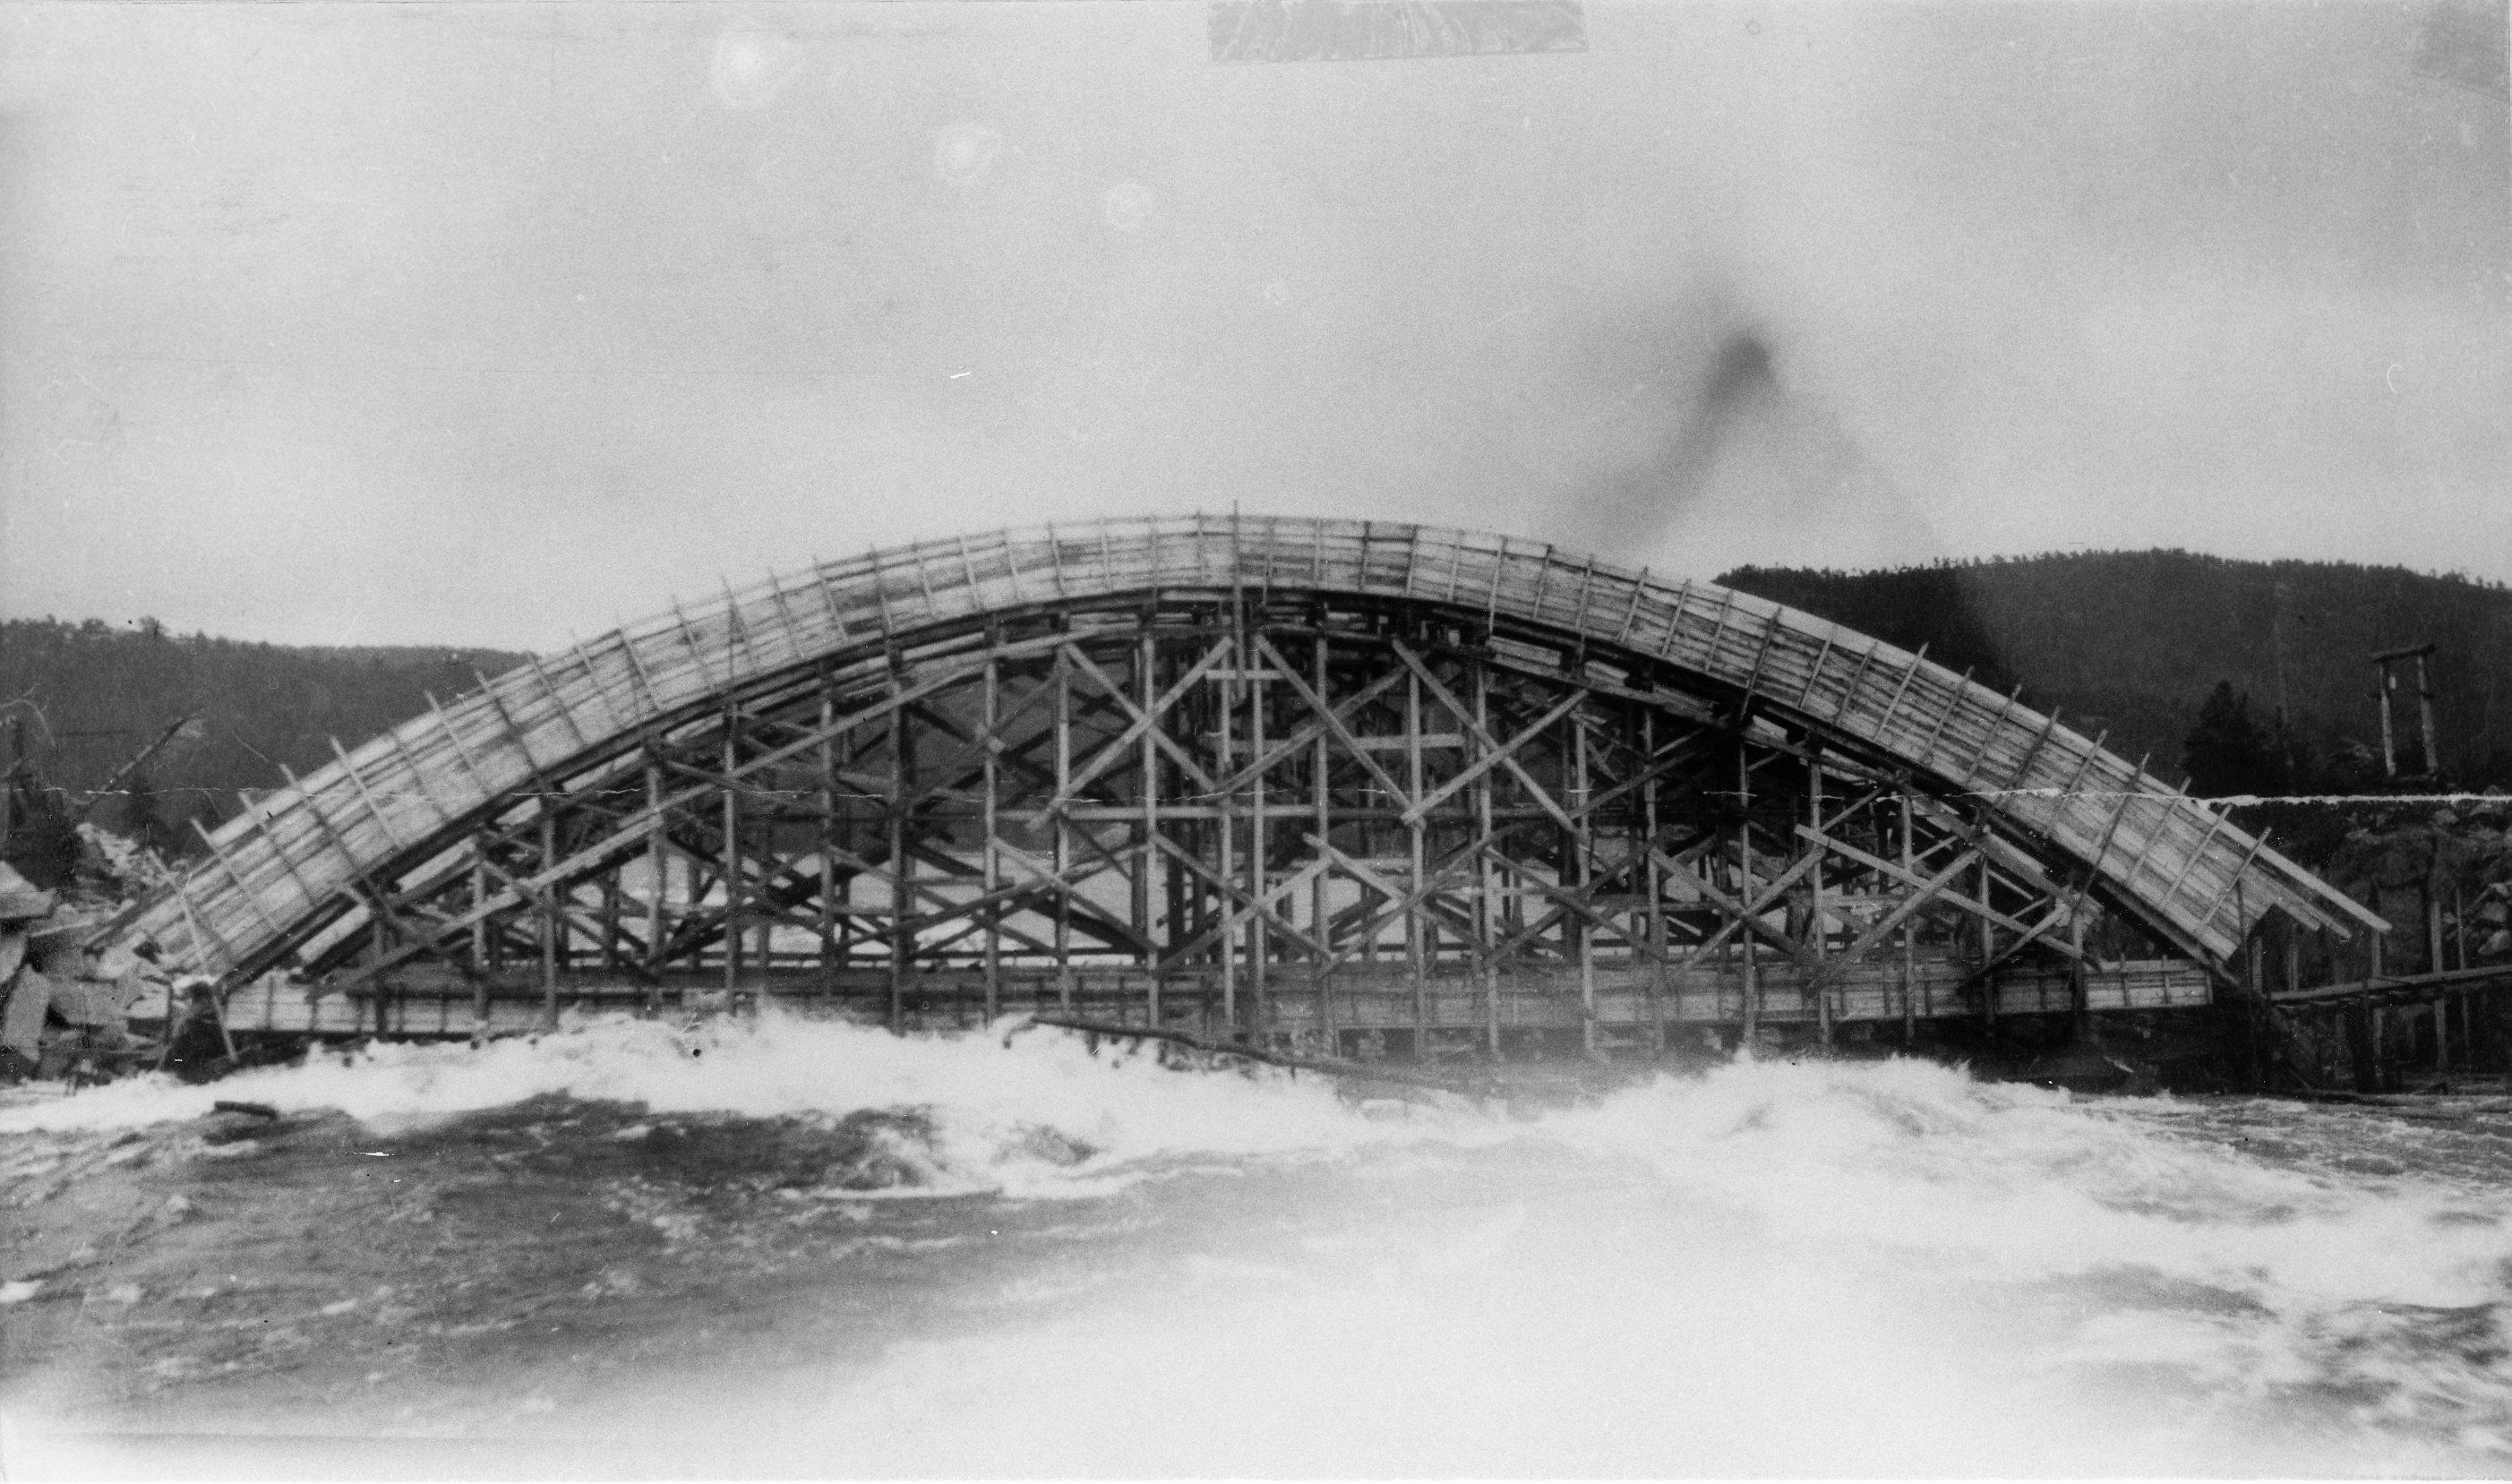 OB Historisk. Storflom Nomeland kraftverk bru 1917